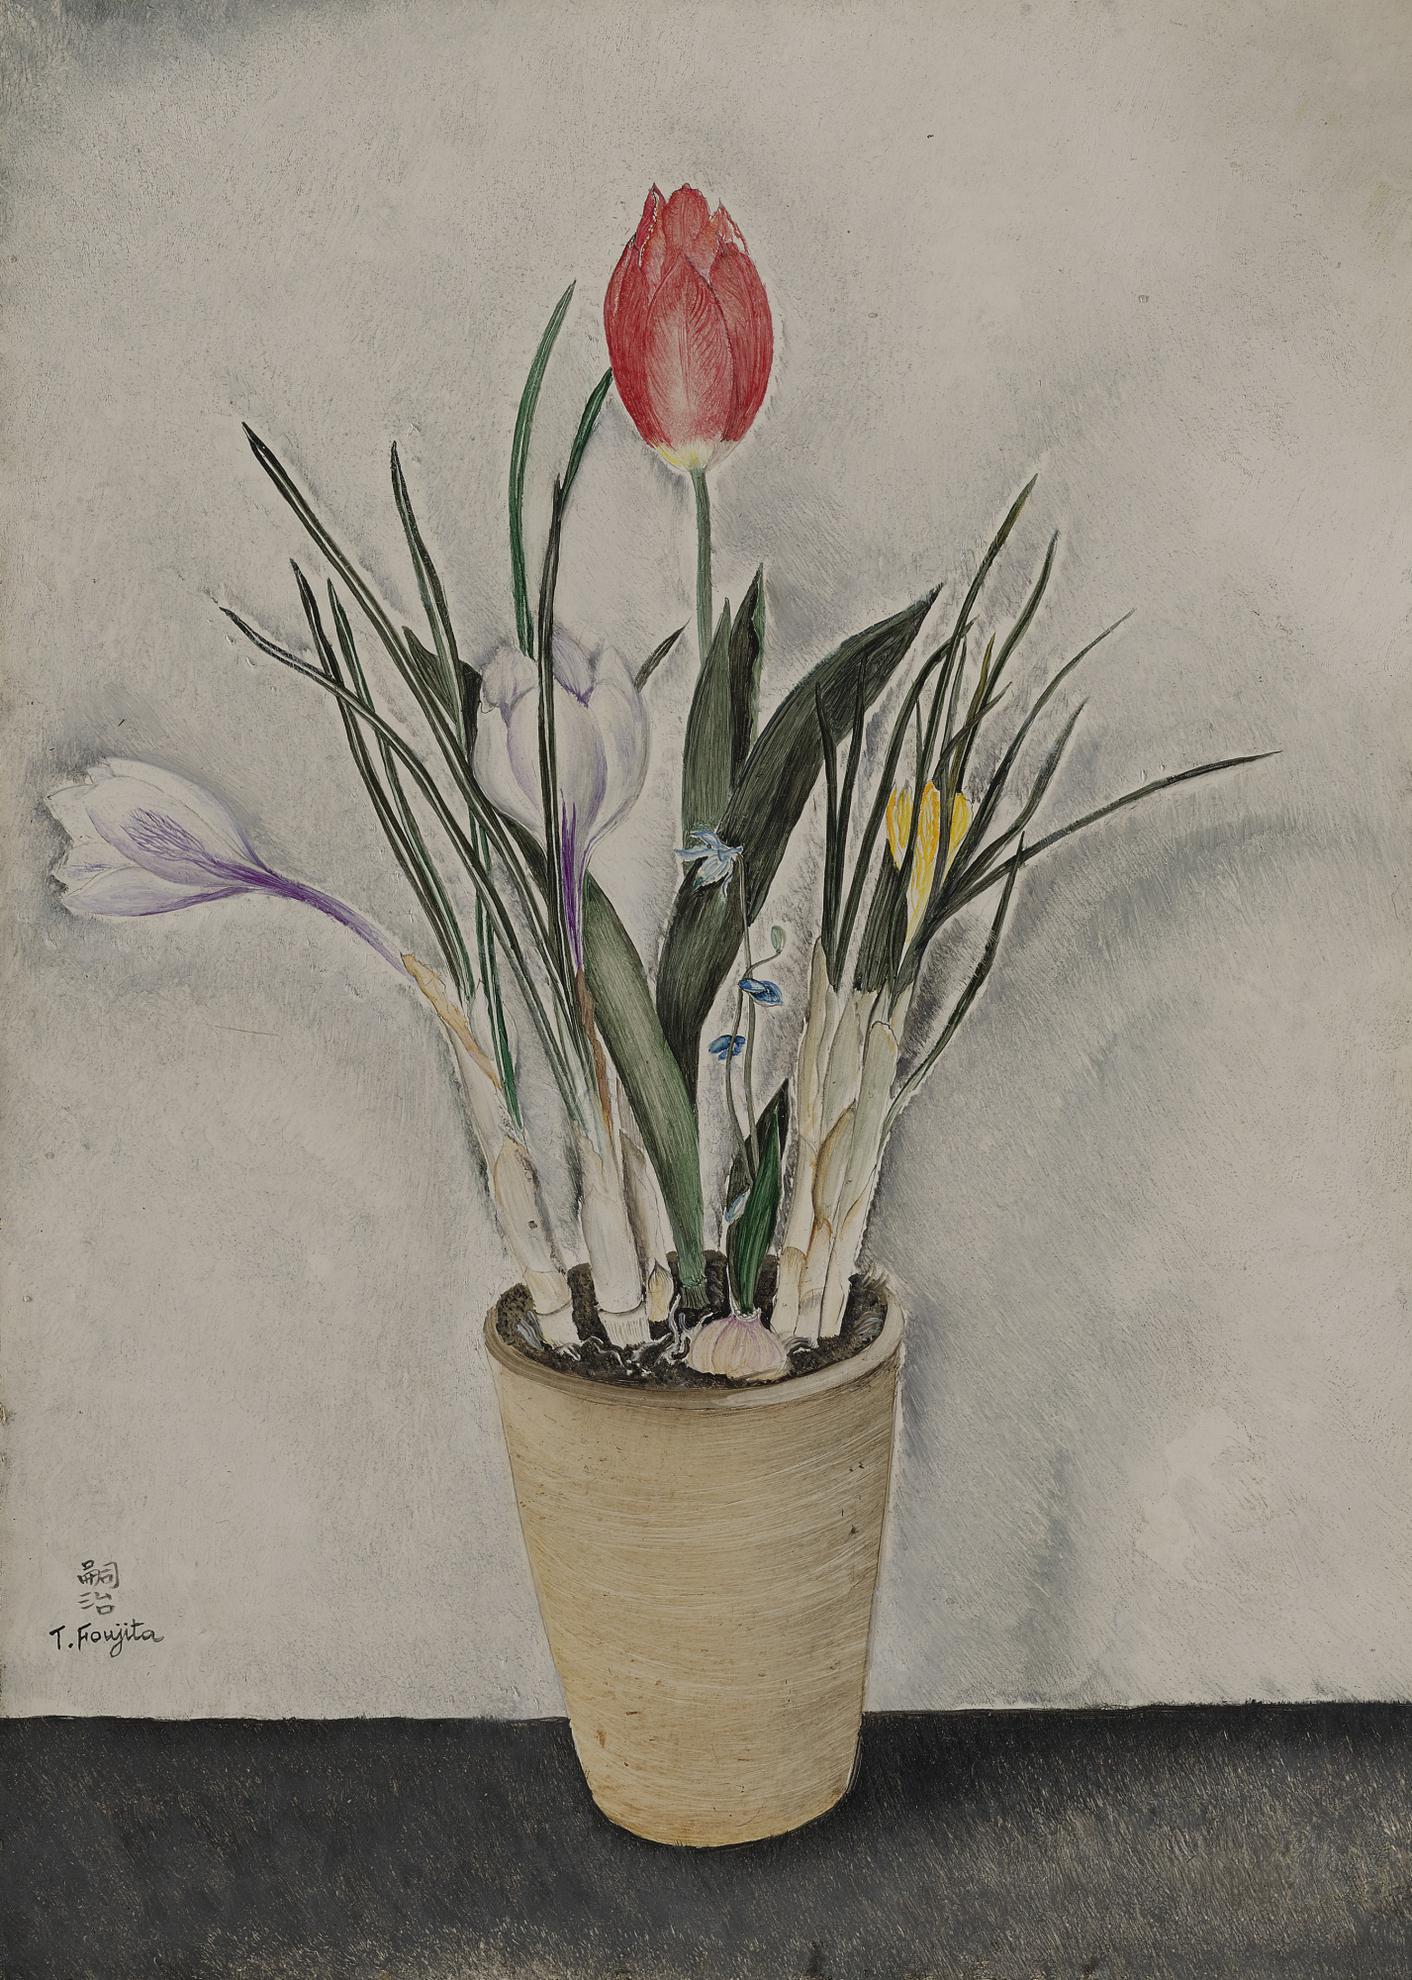 Tsuguharu Foujita-Nature Morte Aux Fleurs-1920